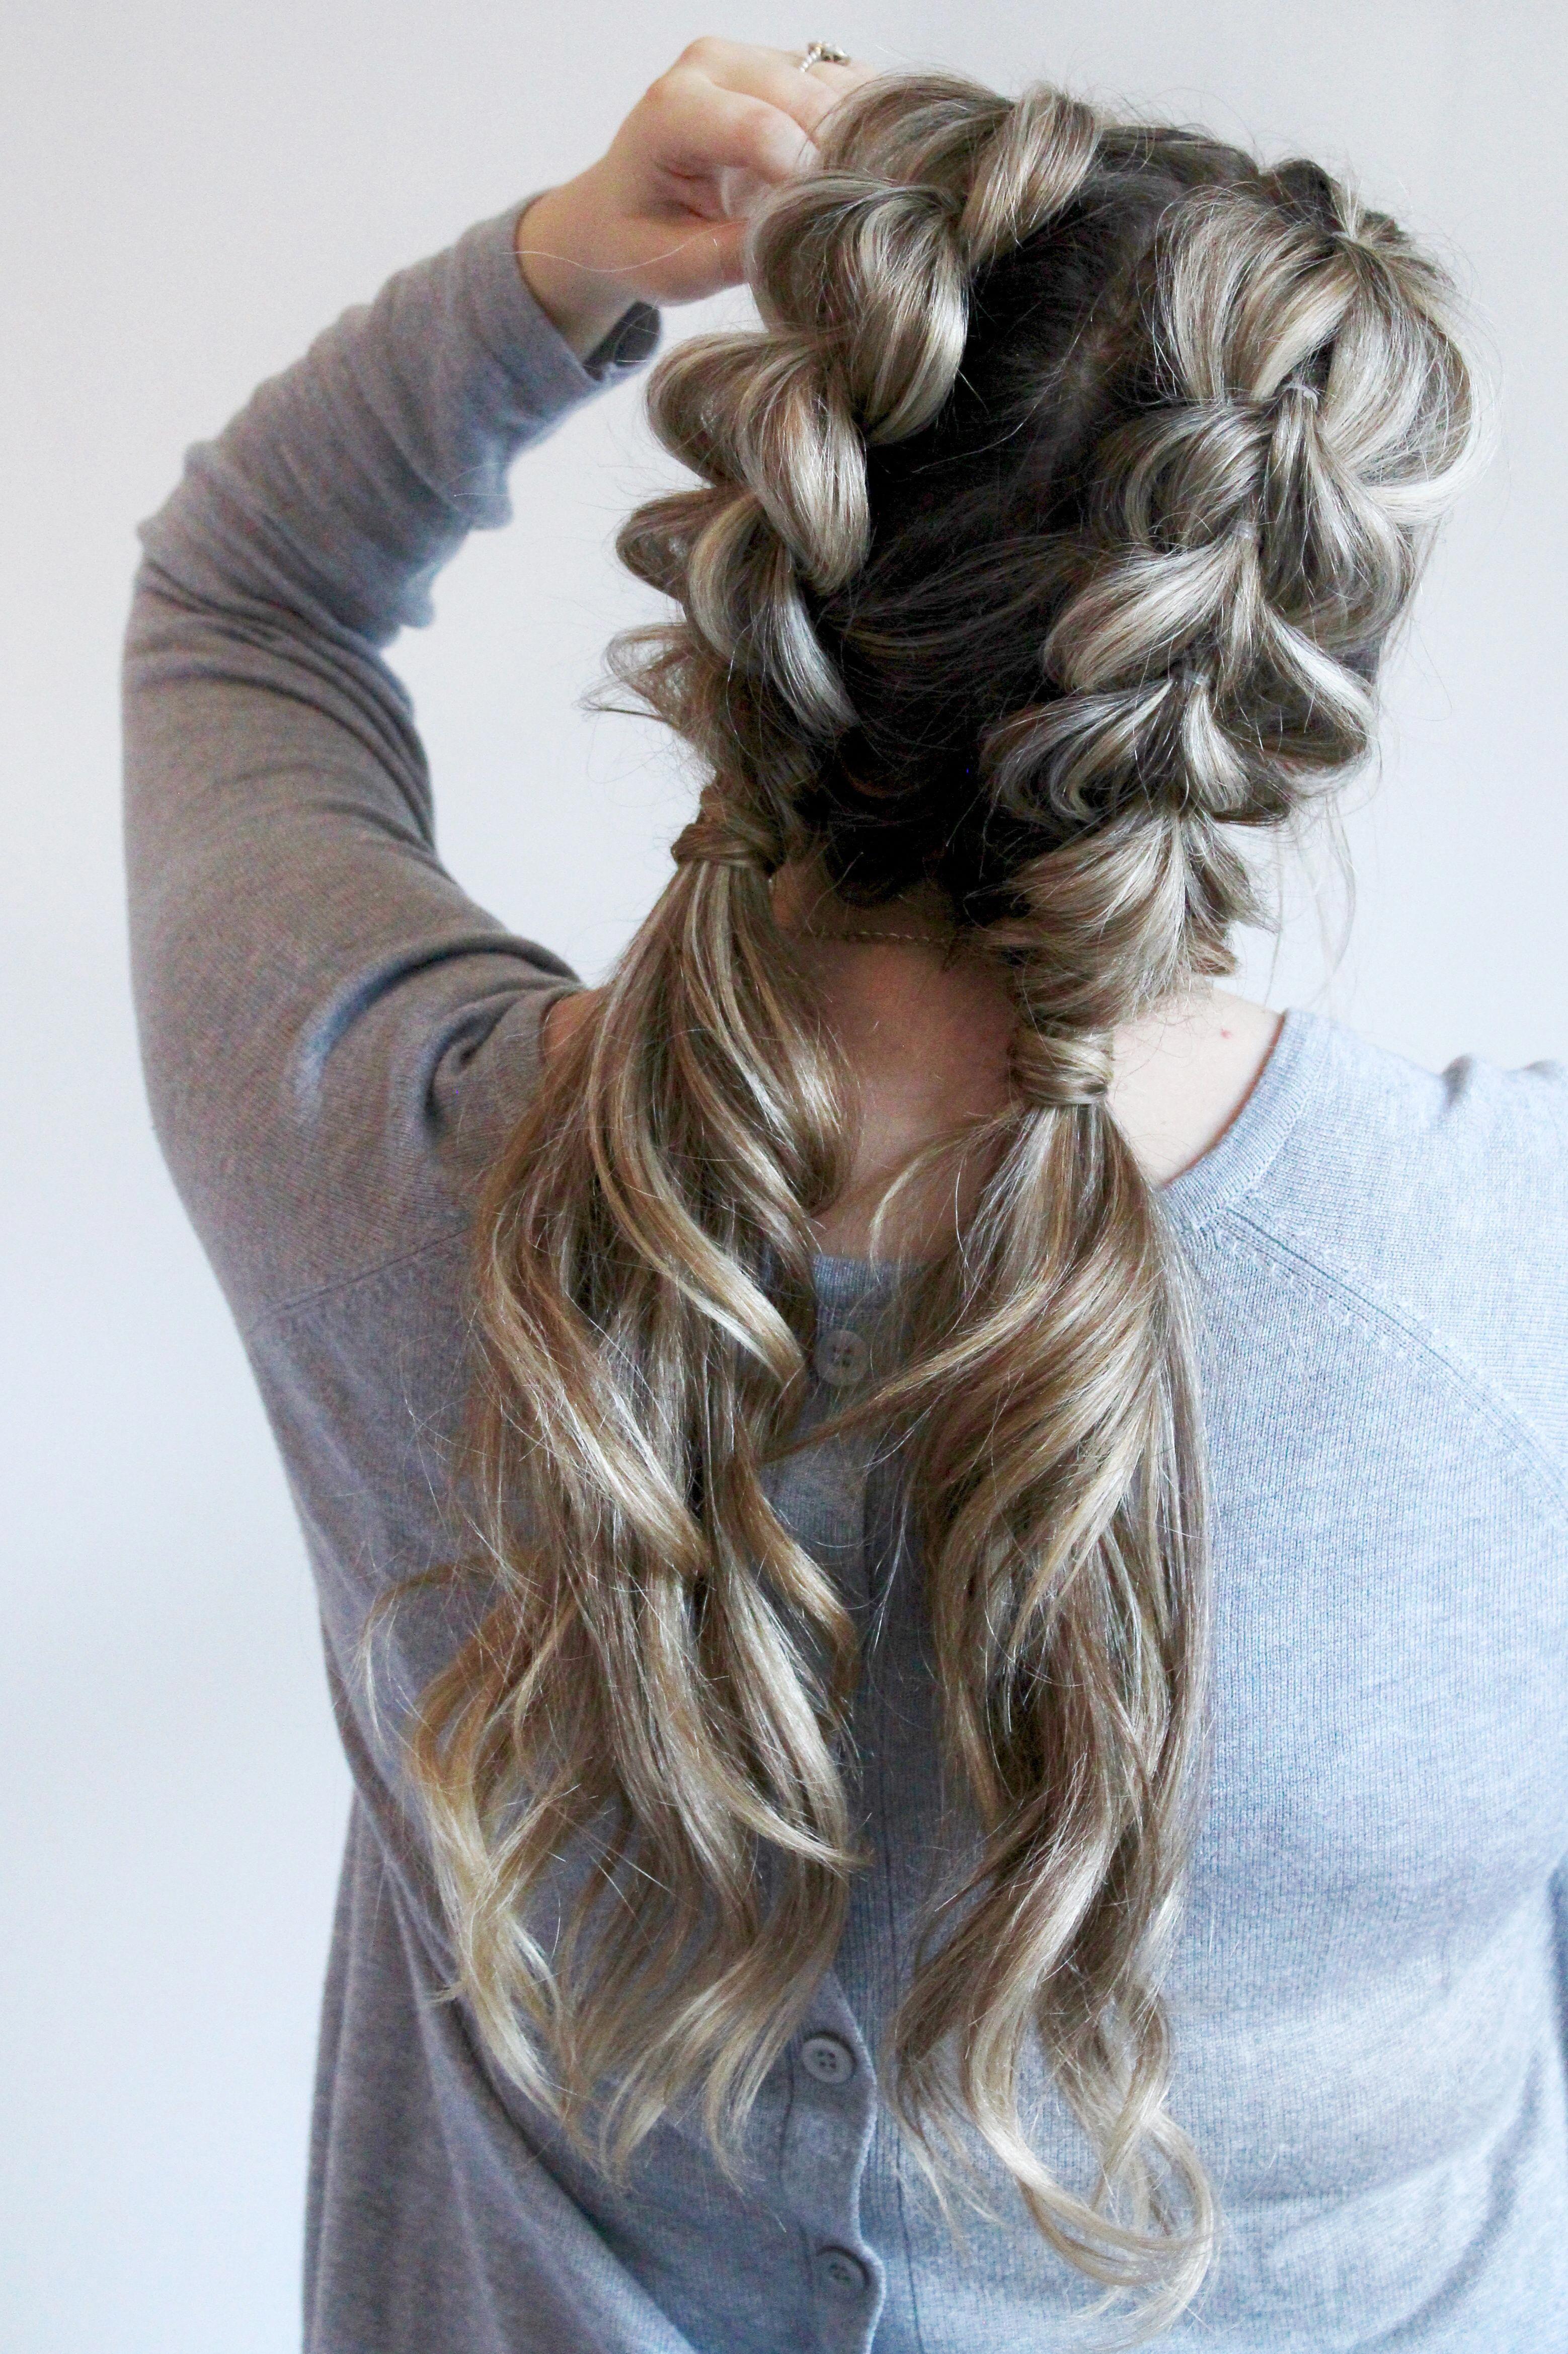 Jumbo Pull Through Braid Pigtails Tutorial Cassie Scroggins Cool Braid Hairstyles Hair Styles Long Hair Styles